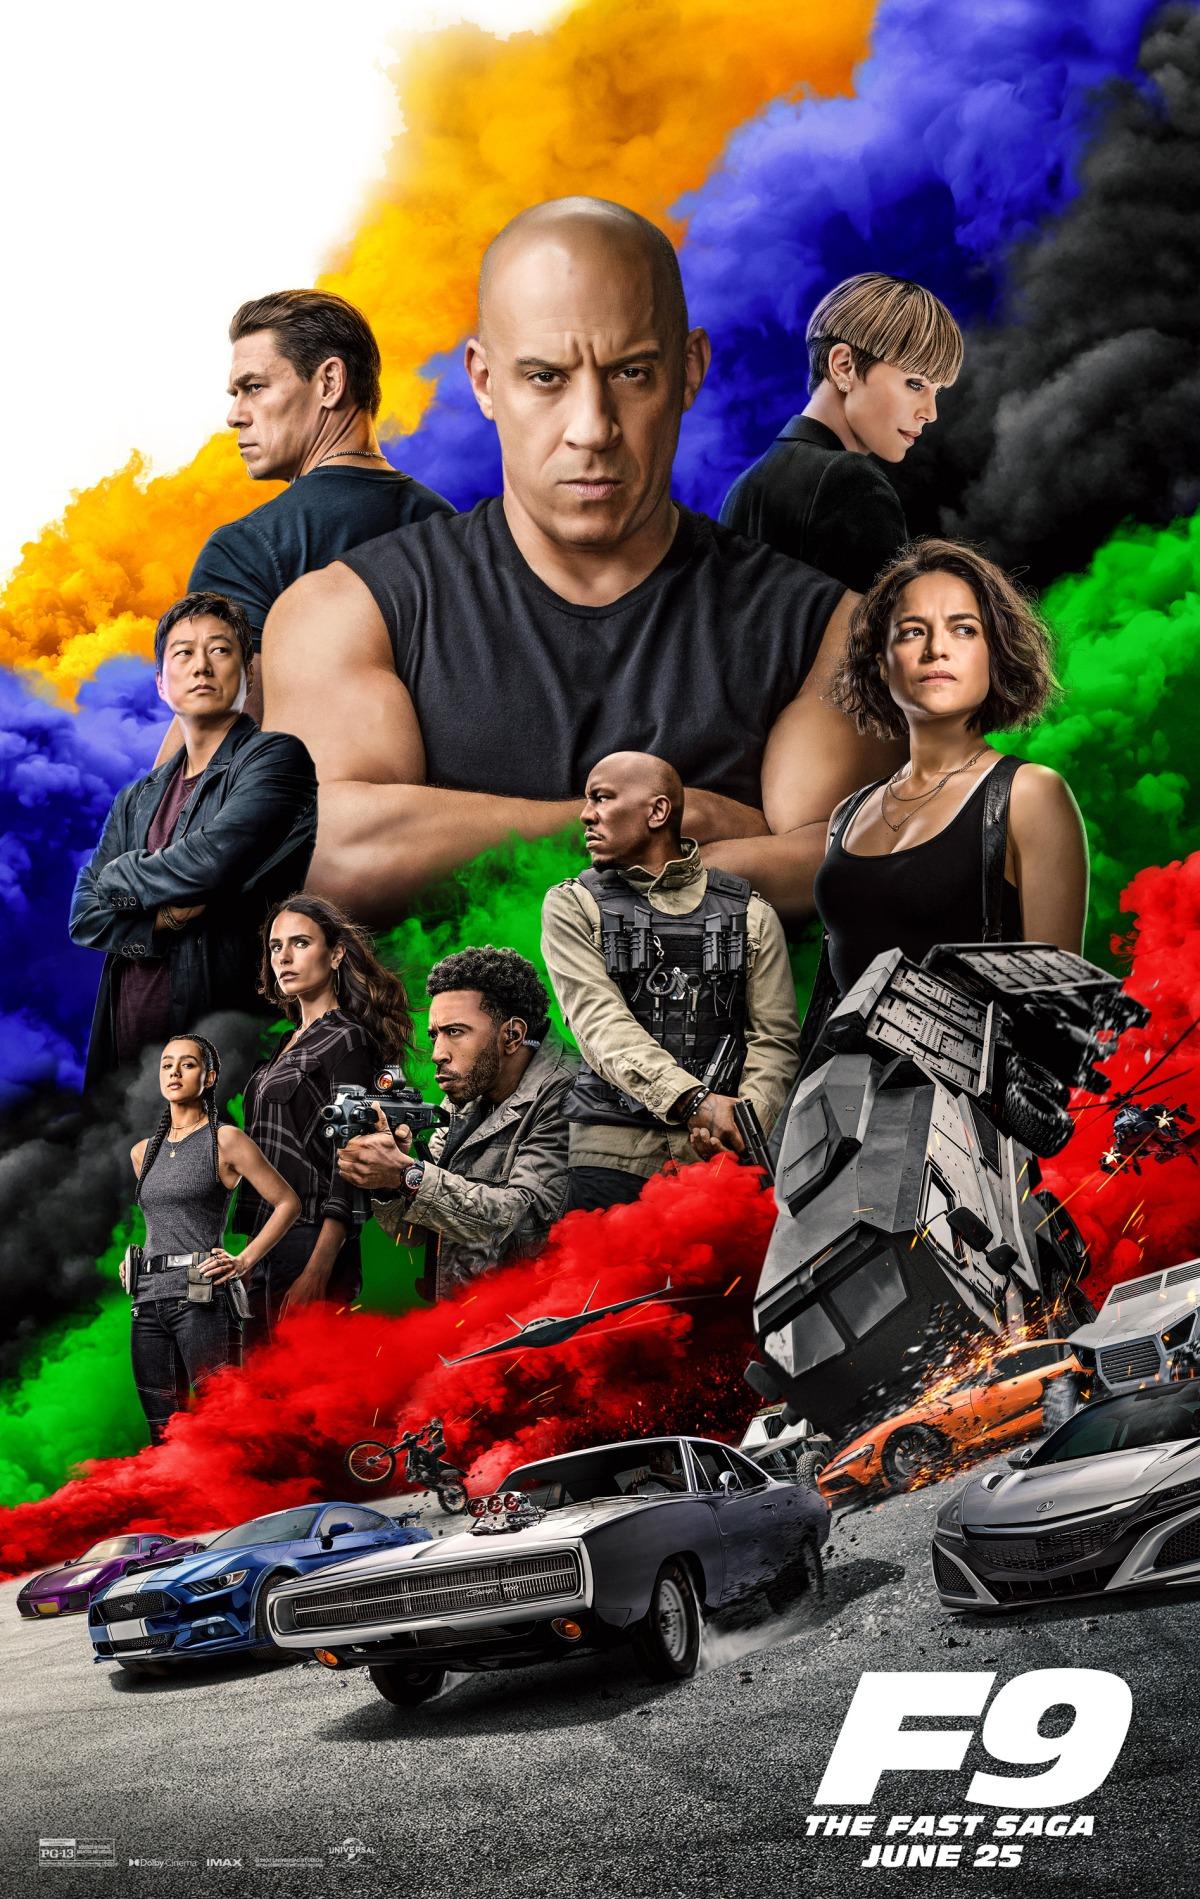 F9: The Fast Saga (a.k.a Fast and Furious 9) (2021, Dir. JustinLin)